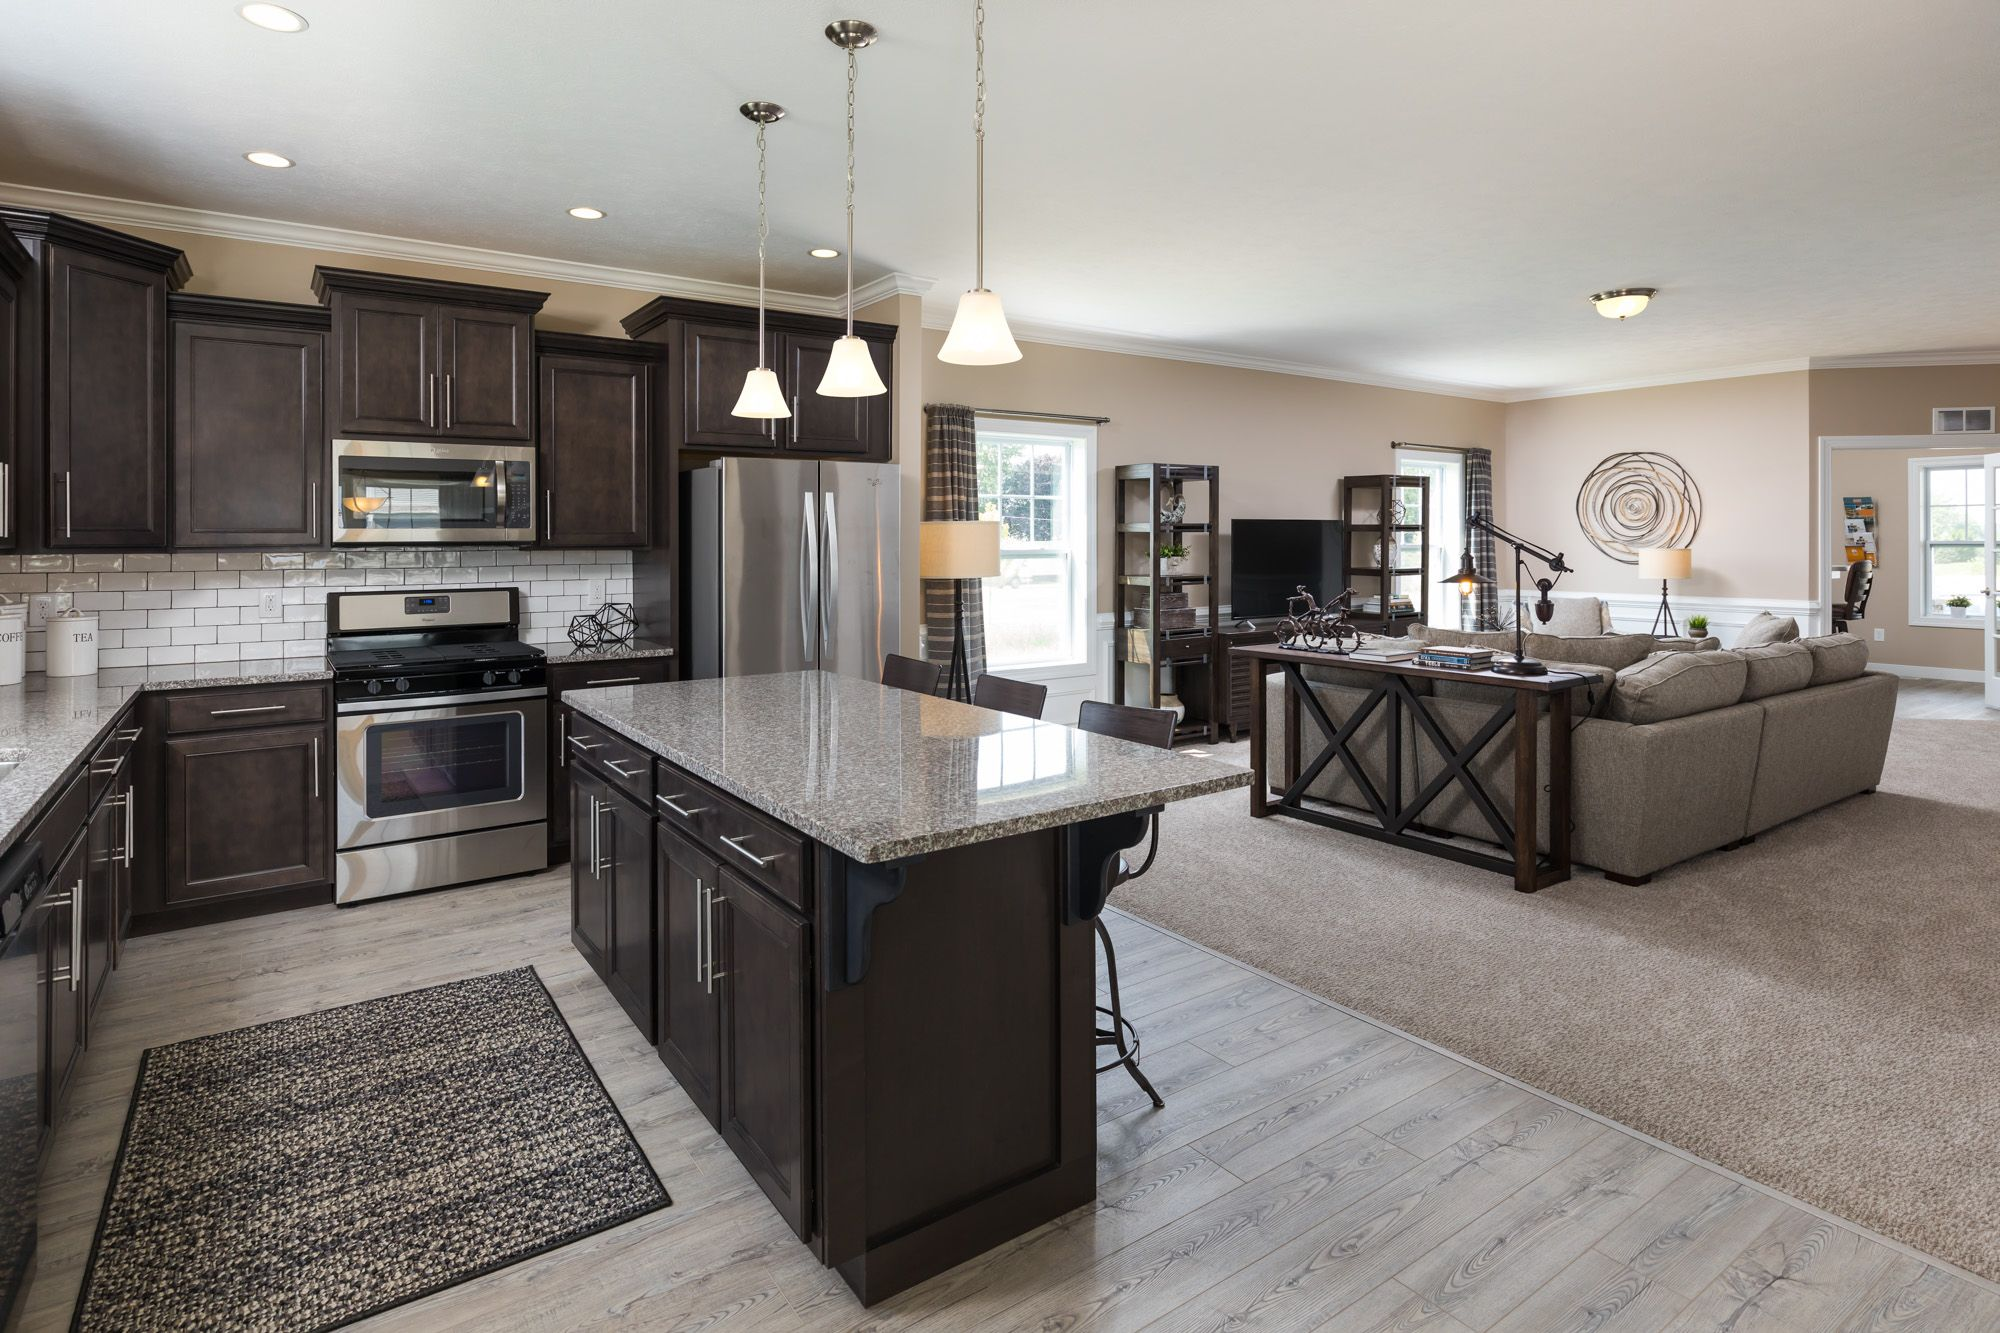 Kitchen featured in the Elements 2600 By Allen Edwin Homes in Benton Harbor, MI